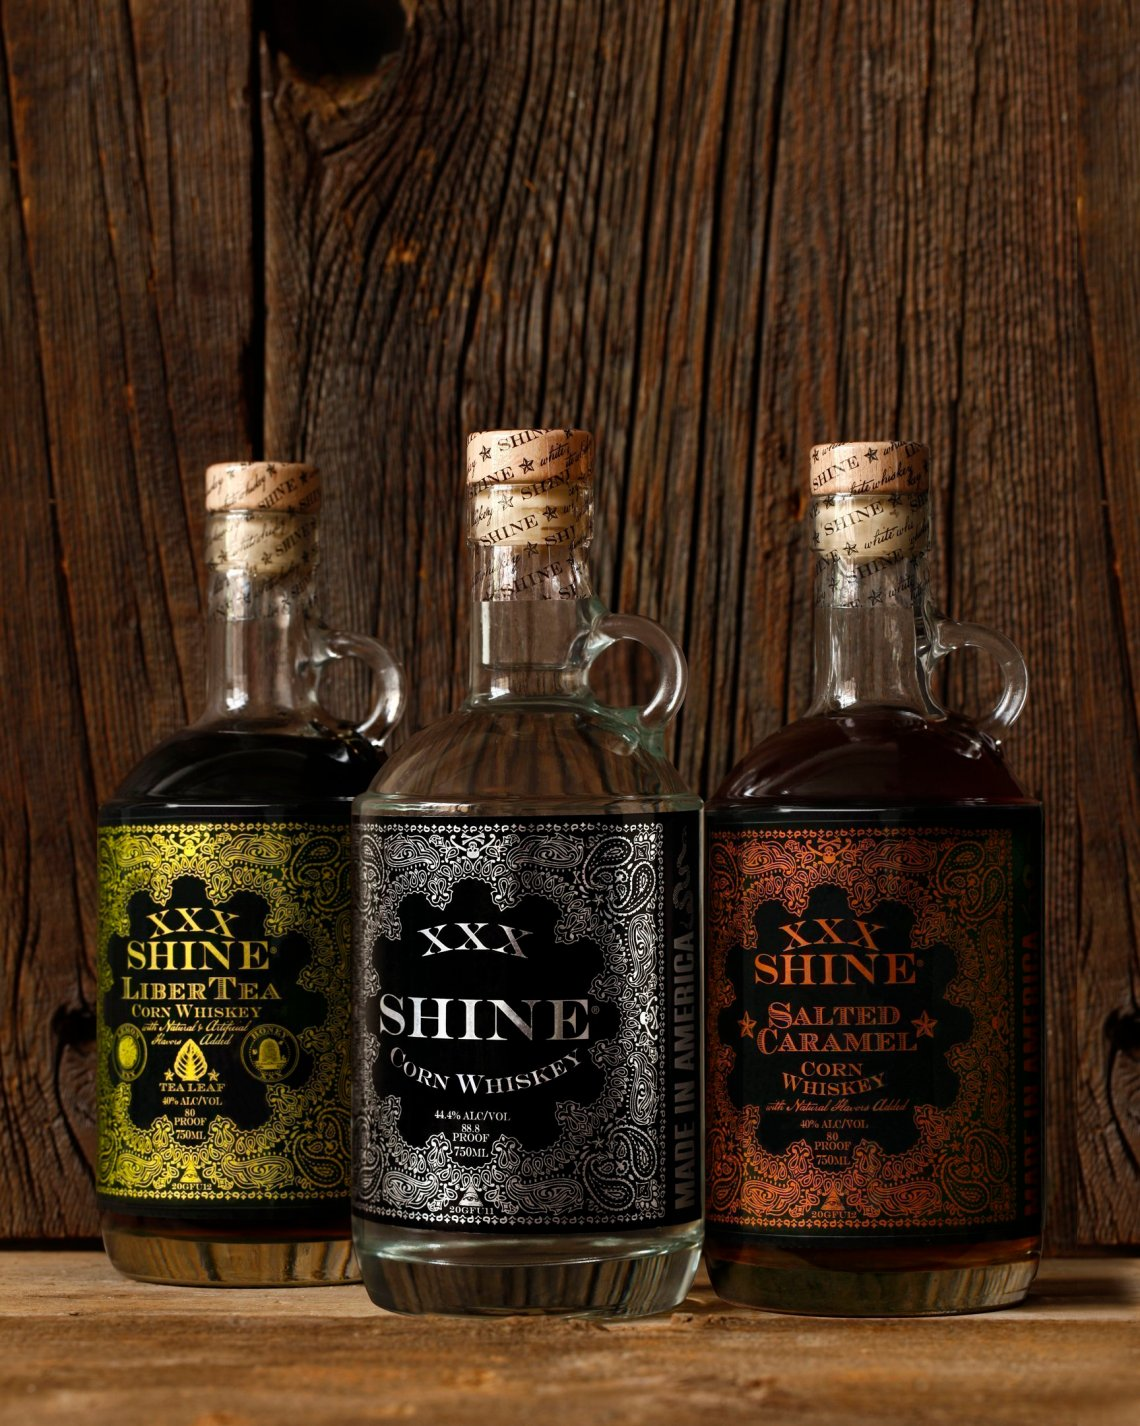 XXX Shine Salted Caramel Corn Whiskey